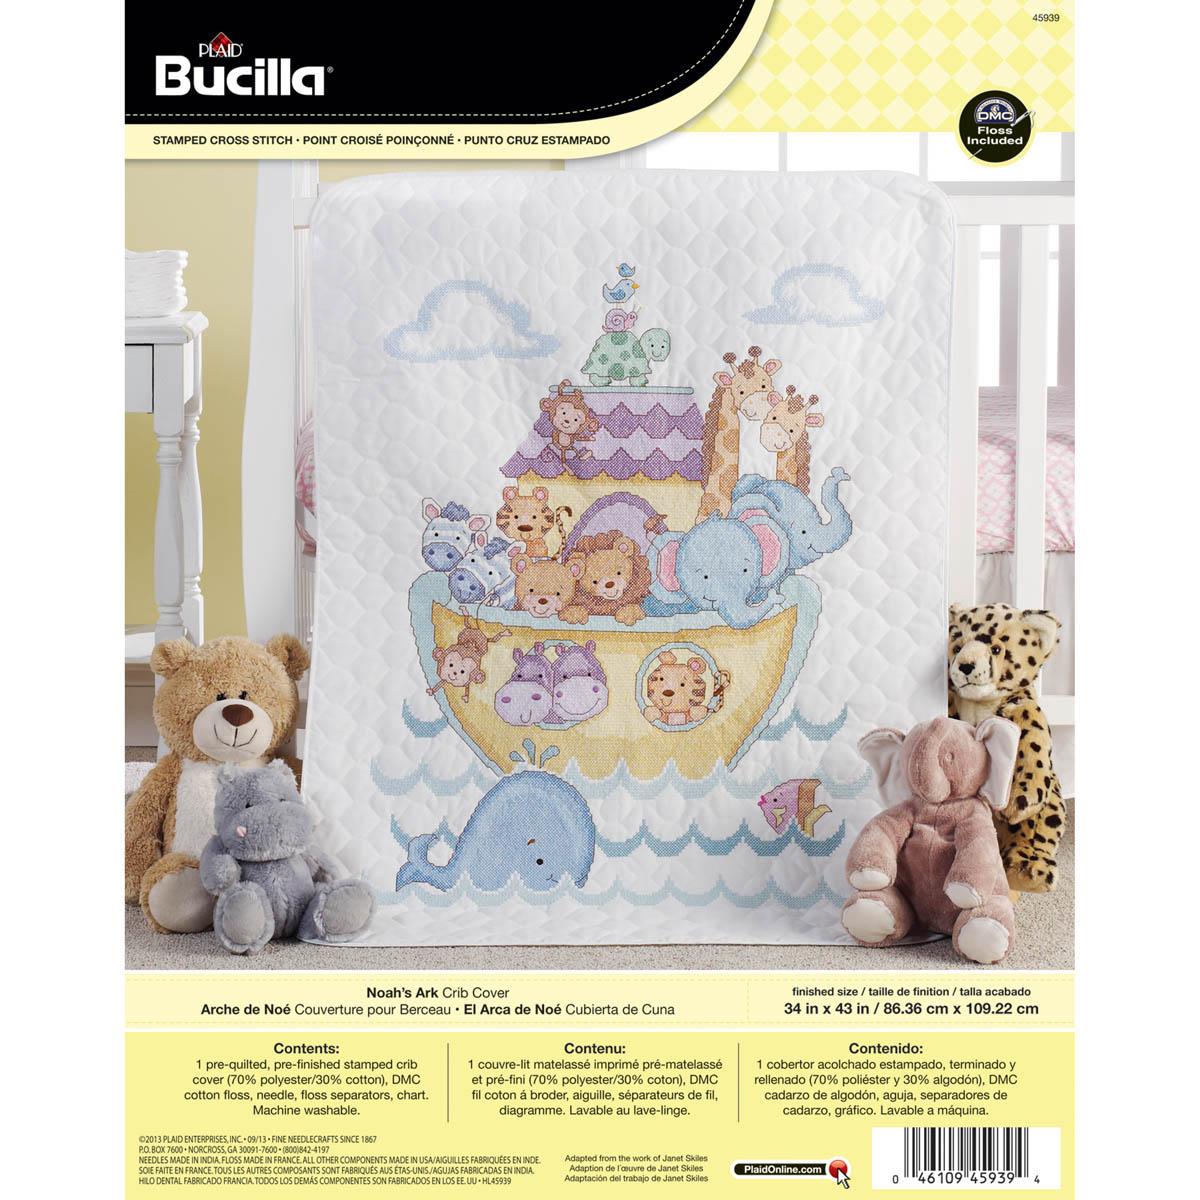 Bucilla ® Baby - Stamped Cross Stitch - Crib Ensembles - Noah's Ark - Crib Cover Kit